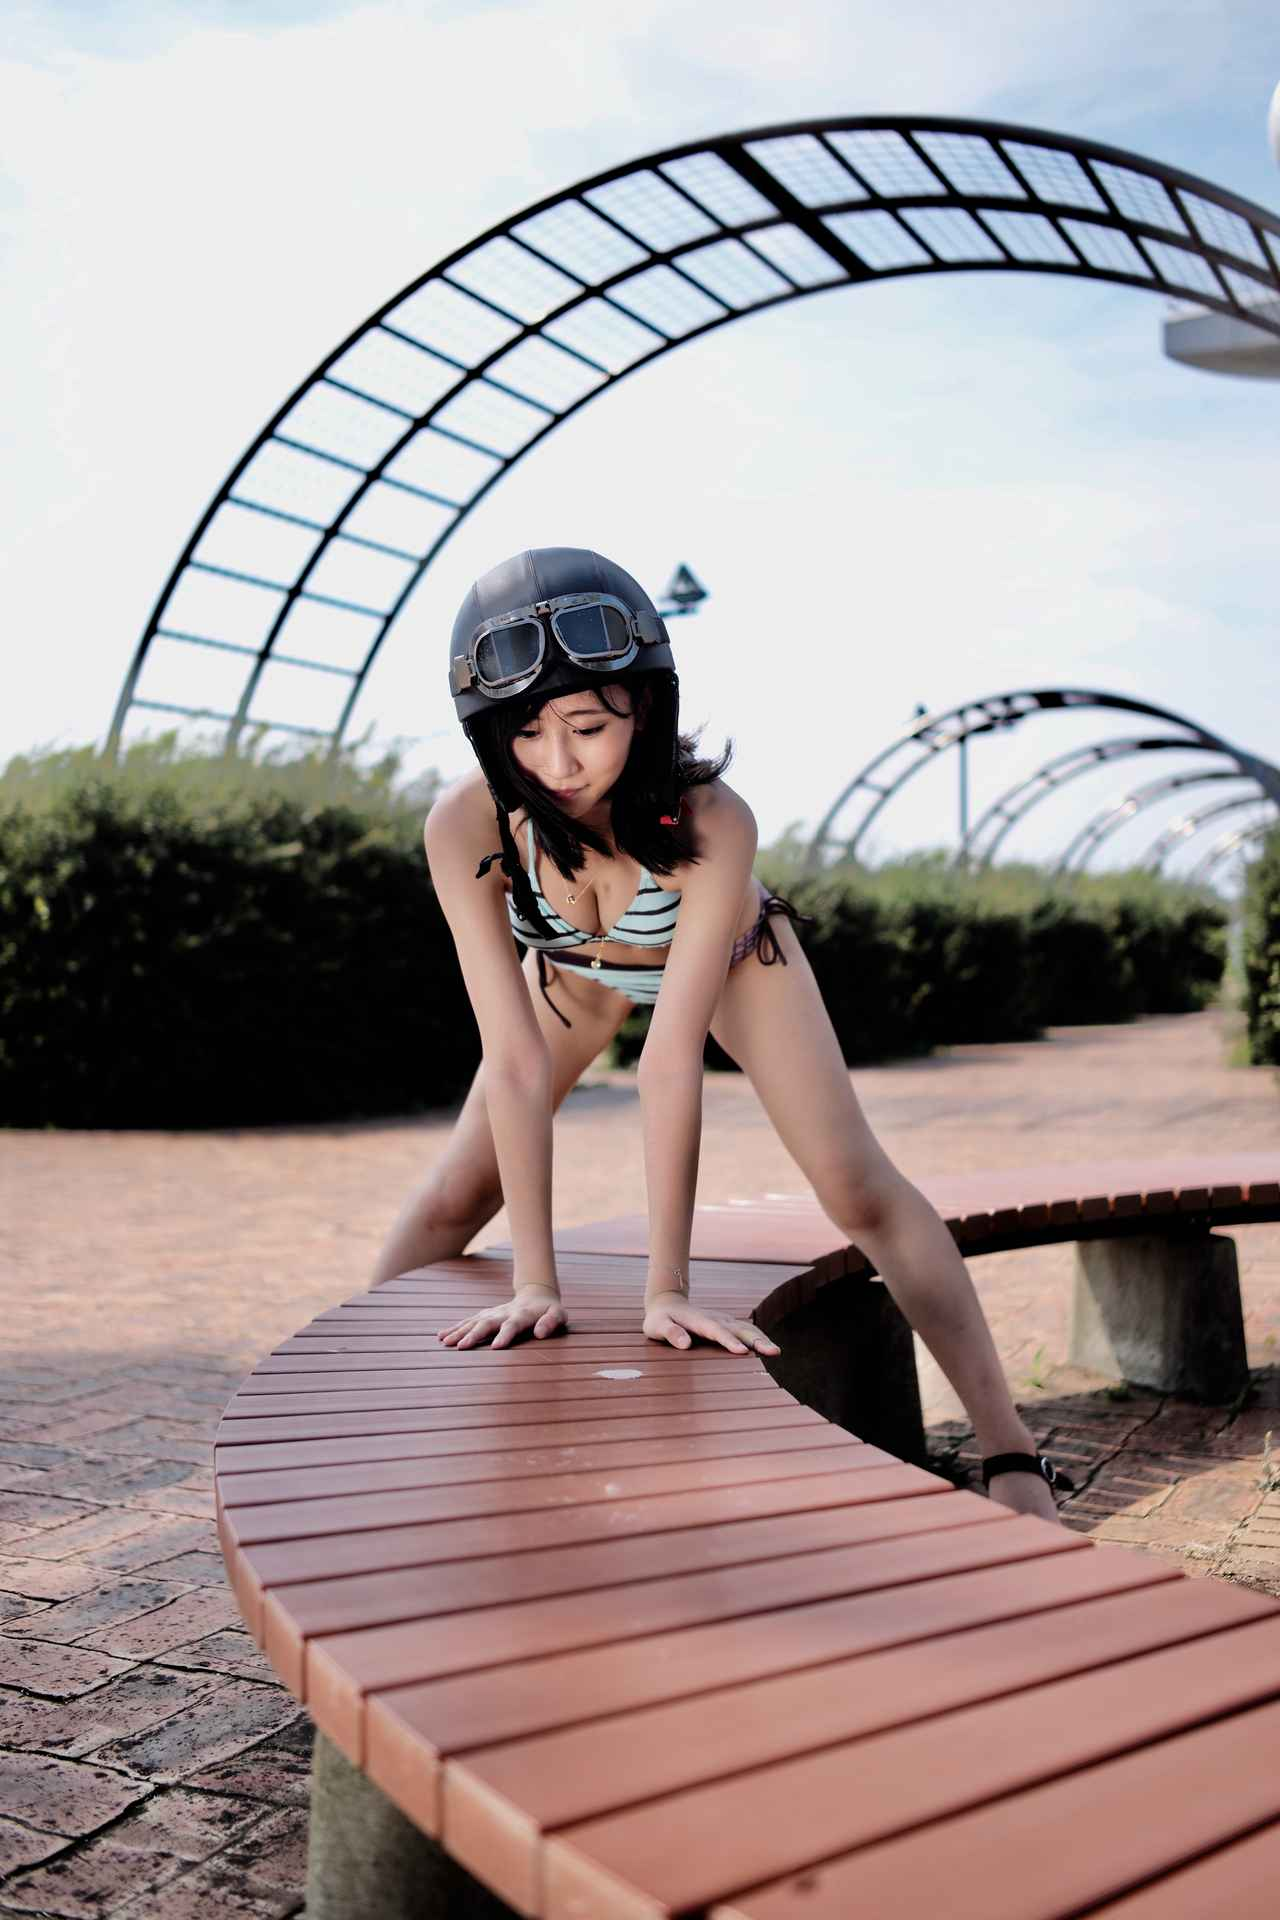 Images : 6番目の画像 - 「グラビア【ヘルメット女子】Sabrina vol.27」のアルバム - LAWRENCE - Motorcycle x Cars + α = Your Life.